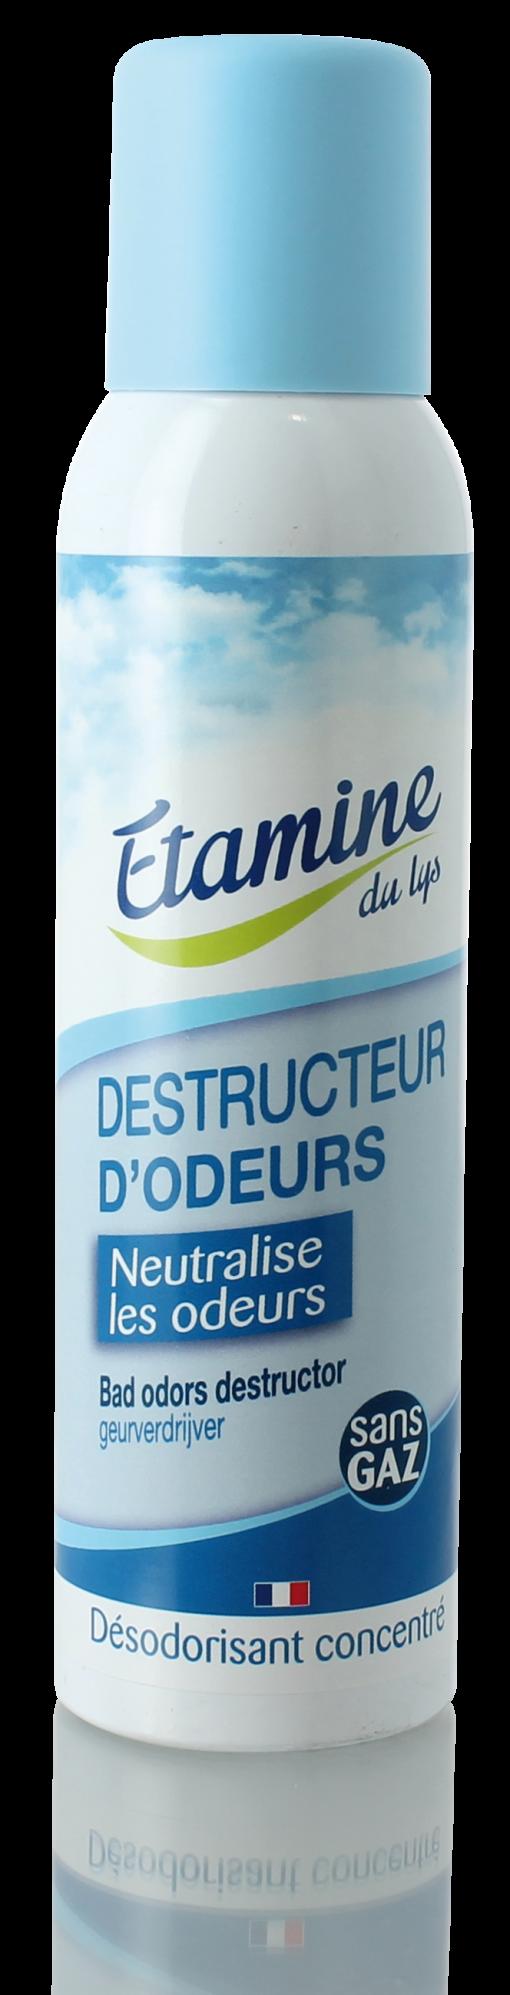 DESODORISANT DESTRUCTEUR D'ODEURS -125 ml- 1